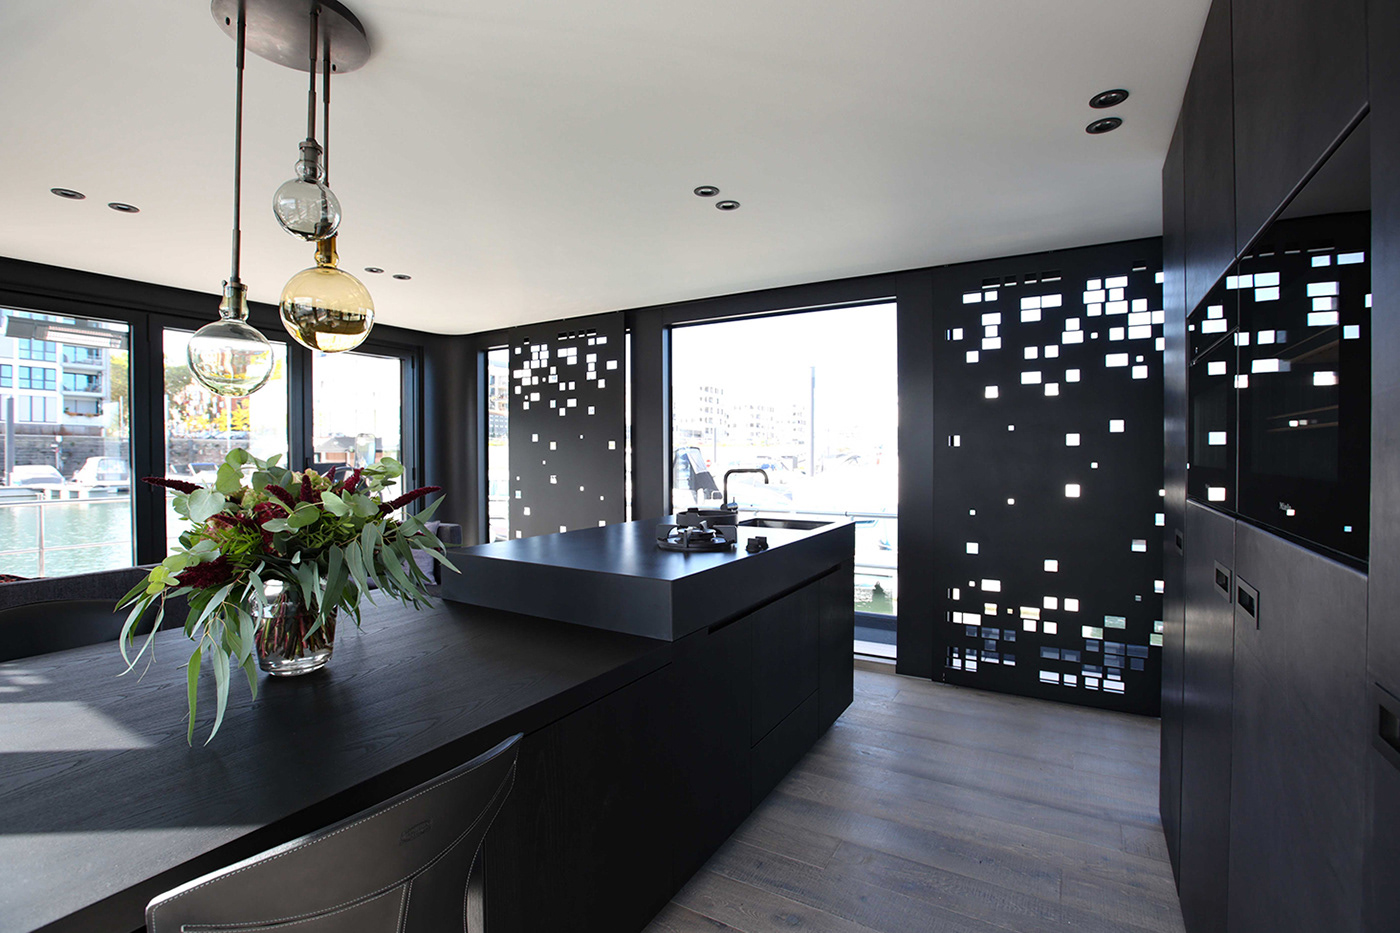 Küchendesign Hausboot Onyx Cruising Home Projekt Nobla Raumgestaltung